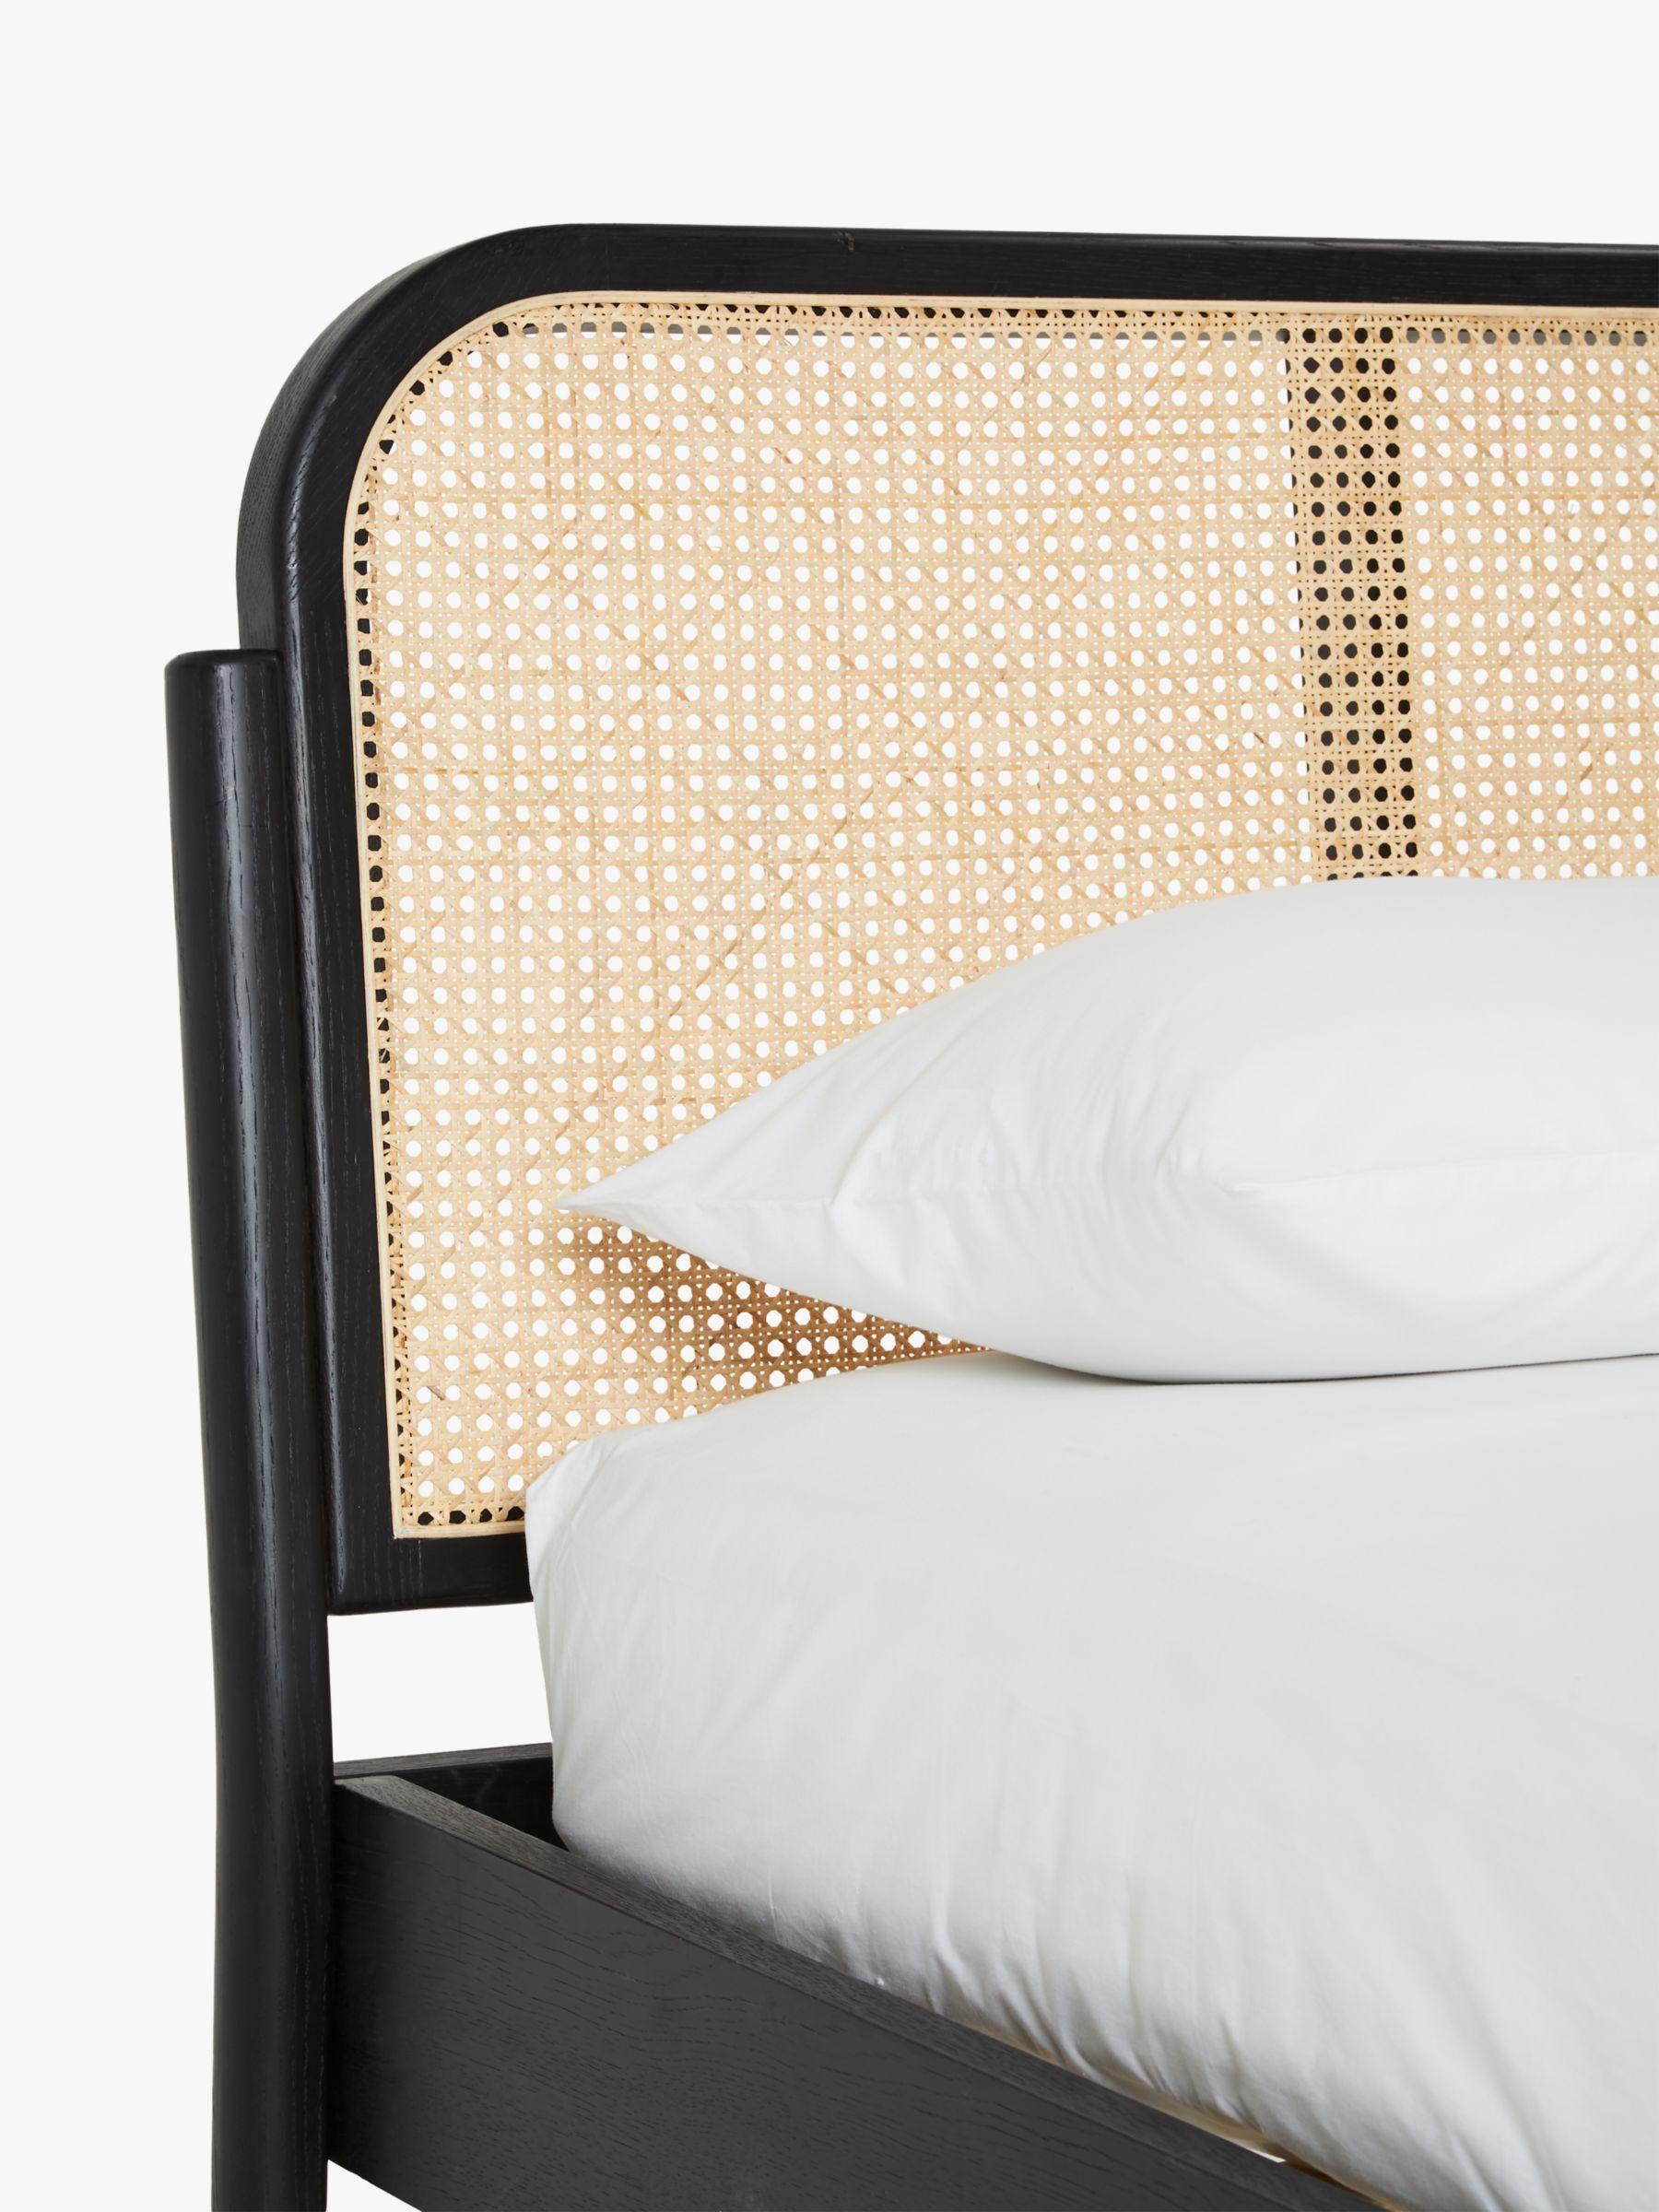 black headboard and frame on john lewis partners rattan bed frame king size black rattan bed rattan bed frame rattan headboard john lewis partners rattan bed frame